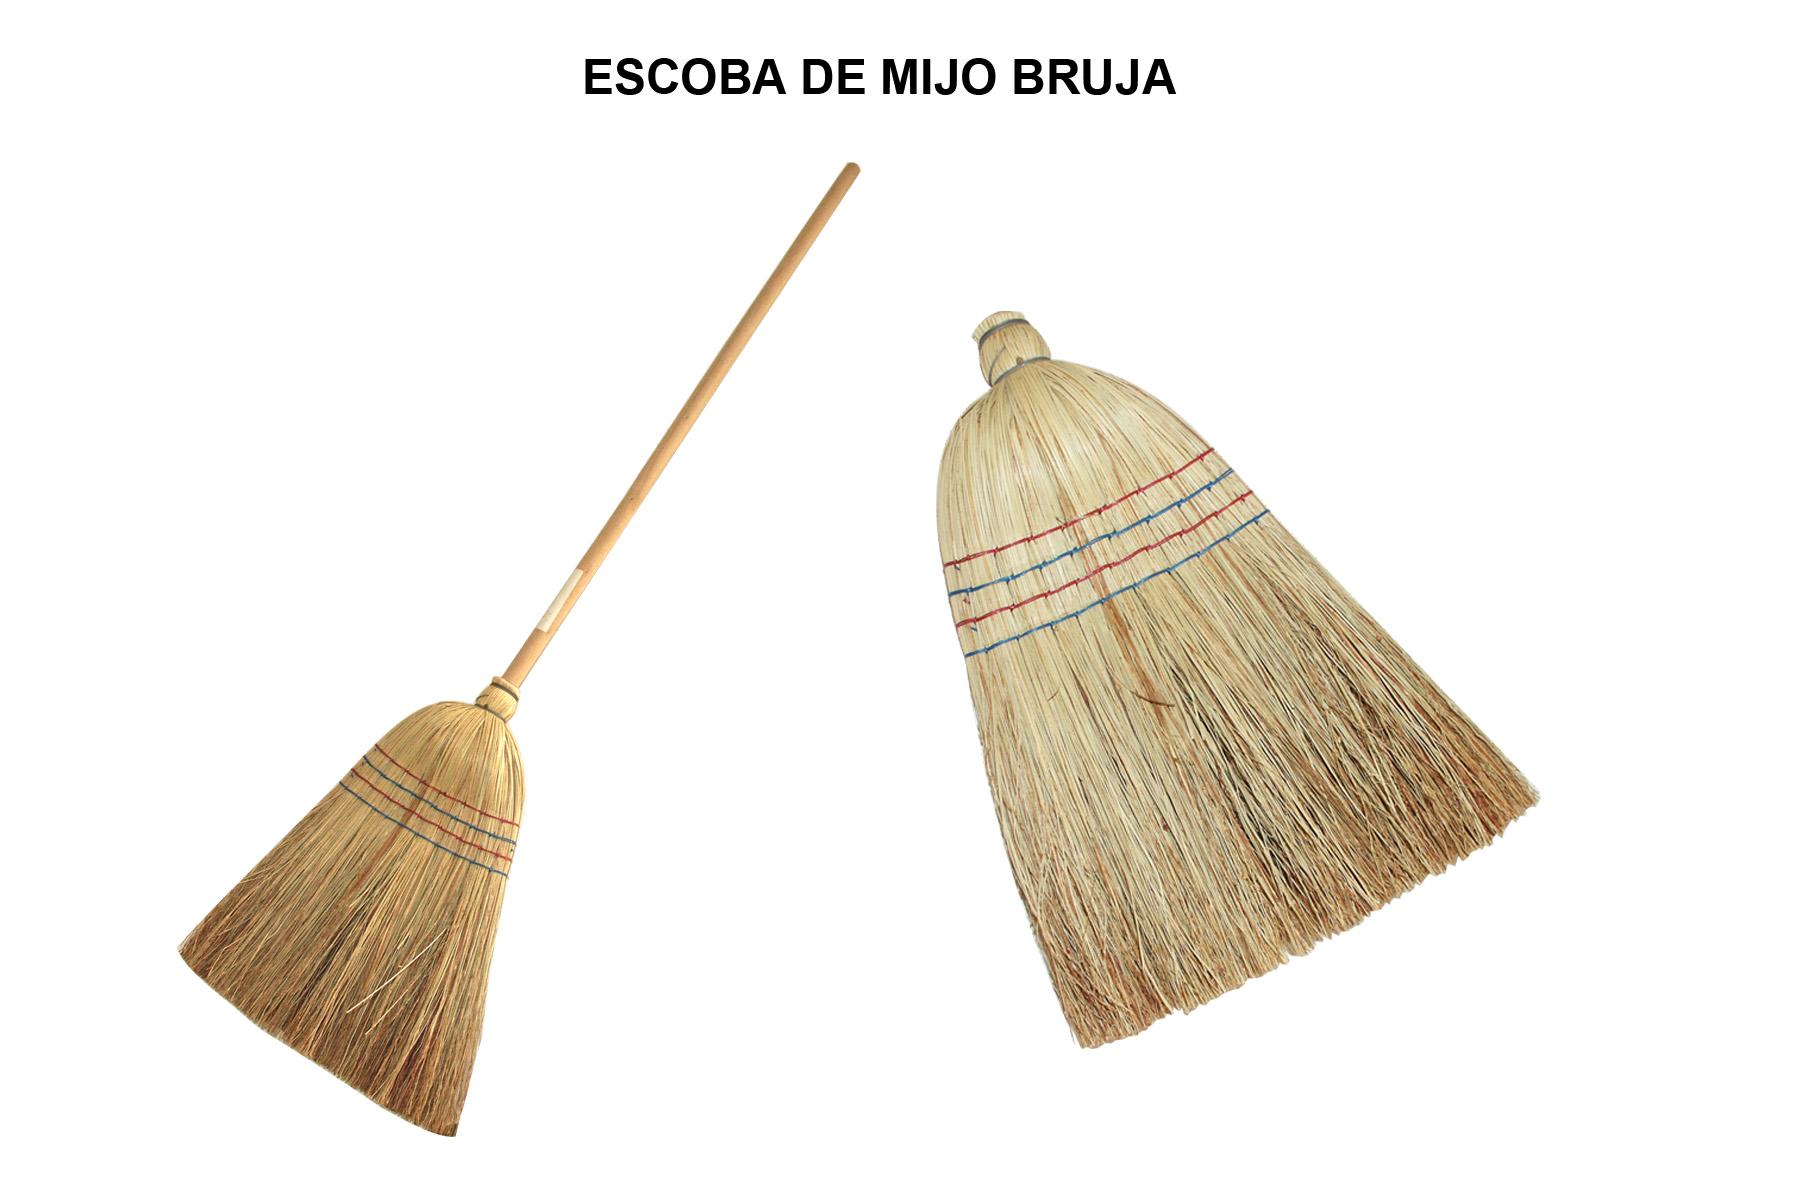 ESCOBA DE MIJO BRUJA